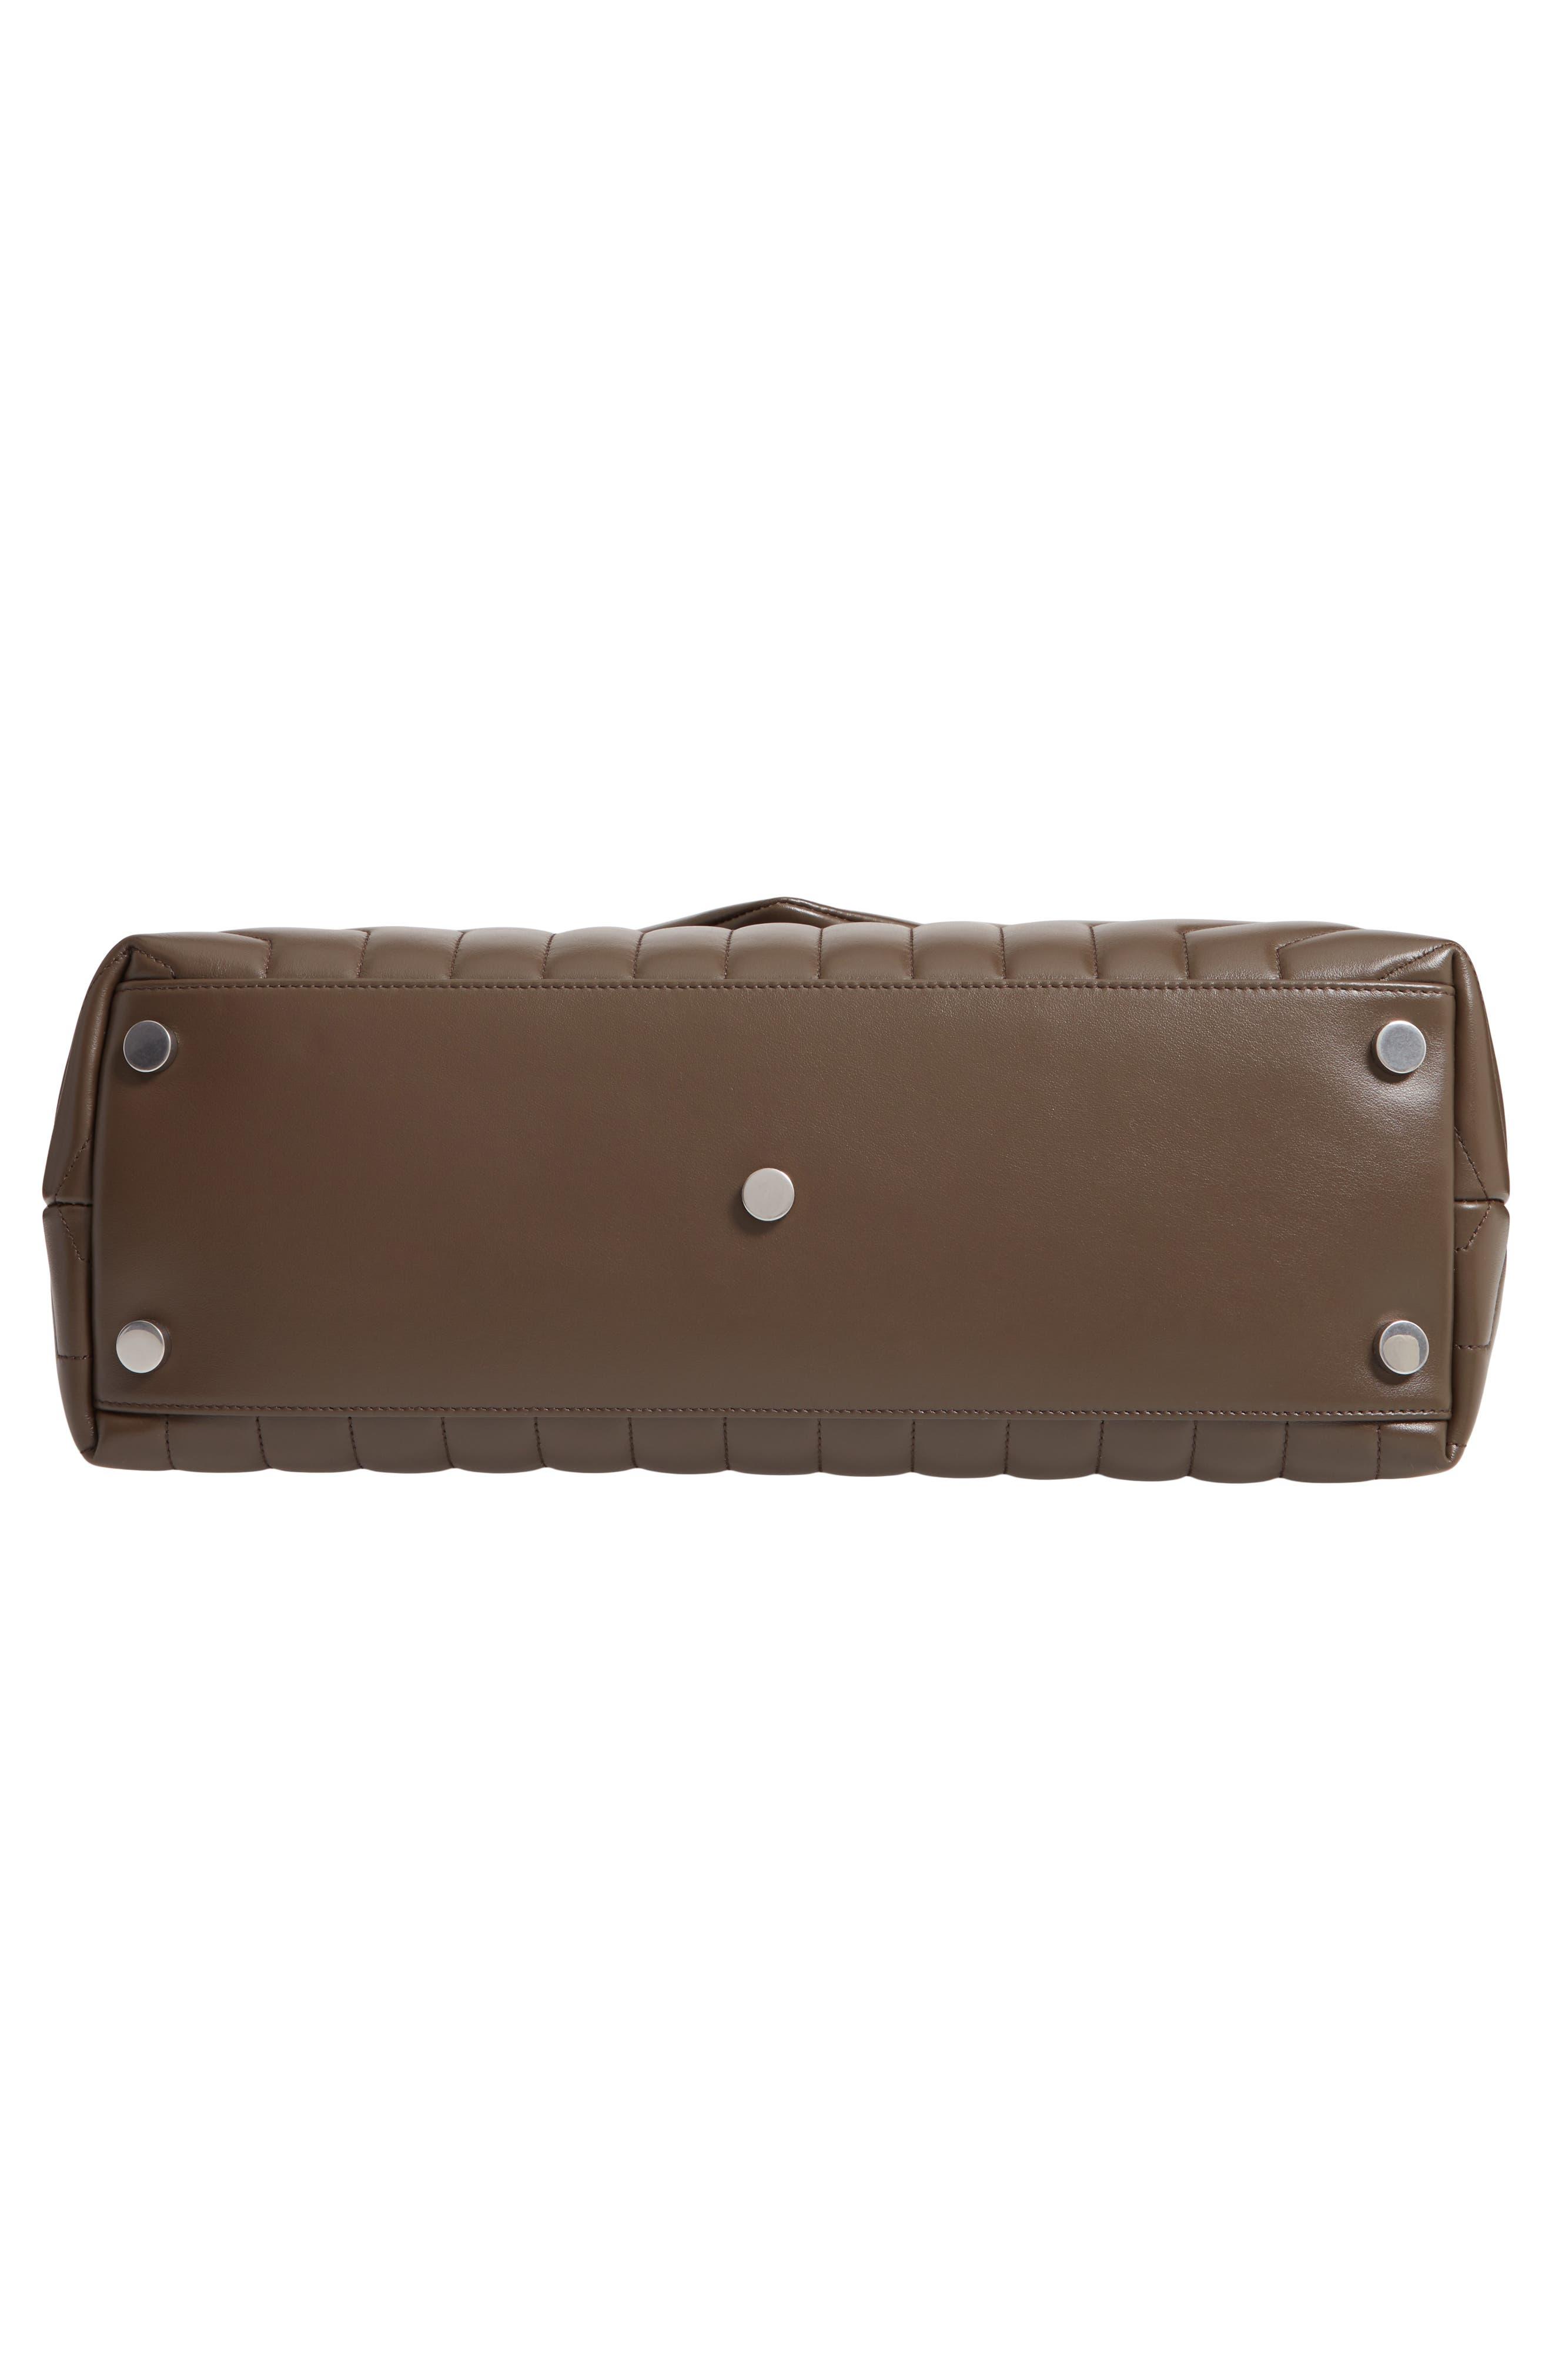 Large Loulou Matelassé Leather Shoulder Bag,                             Alternate thumbnail 6, color,                             FAGGIO/ FAGGIO